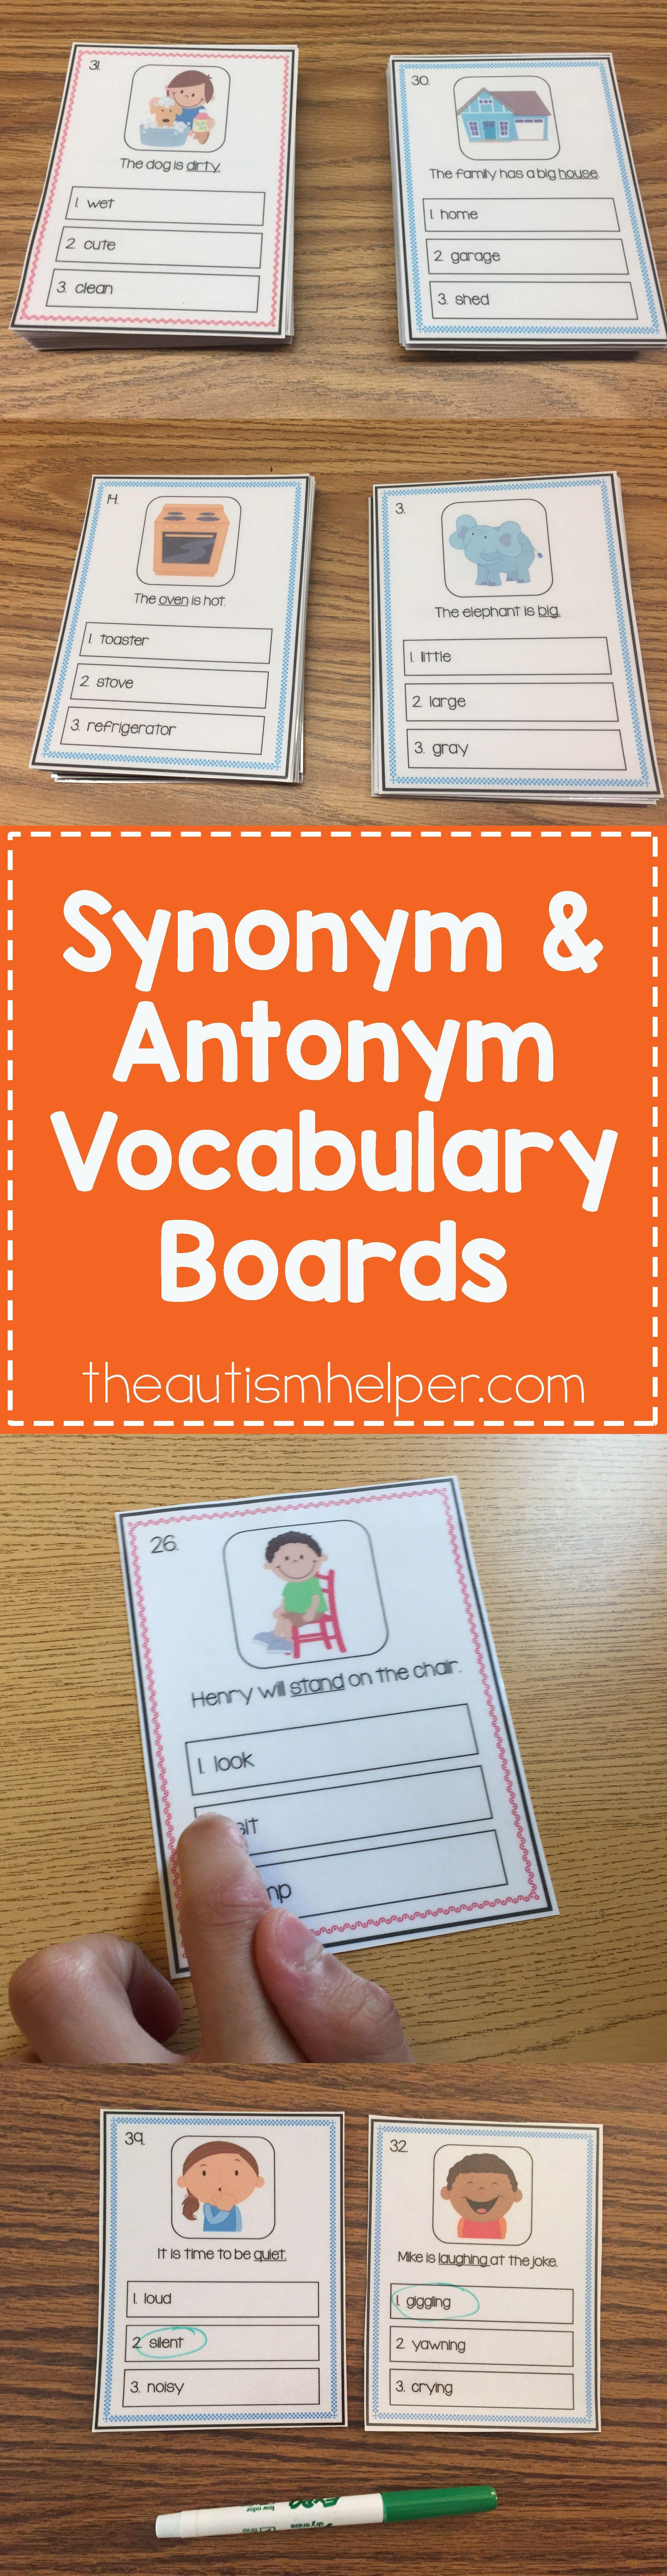 Synonym And Antonym Vocabulary Boards